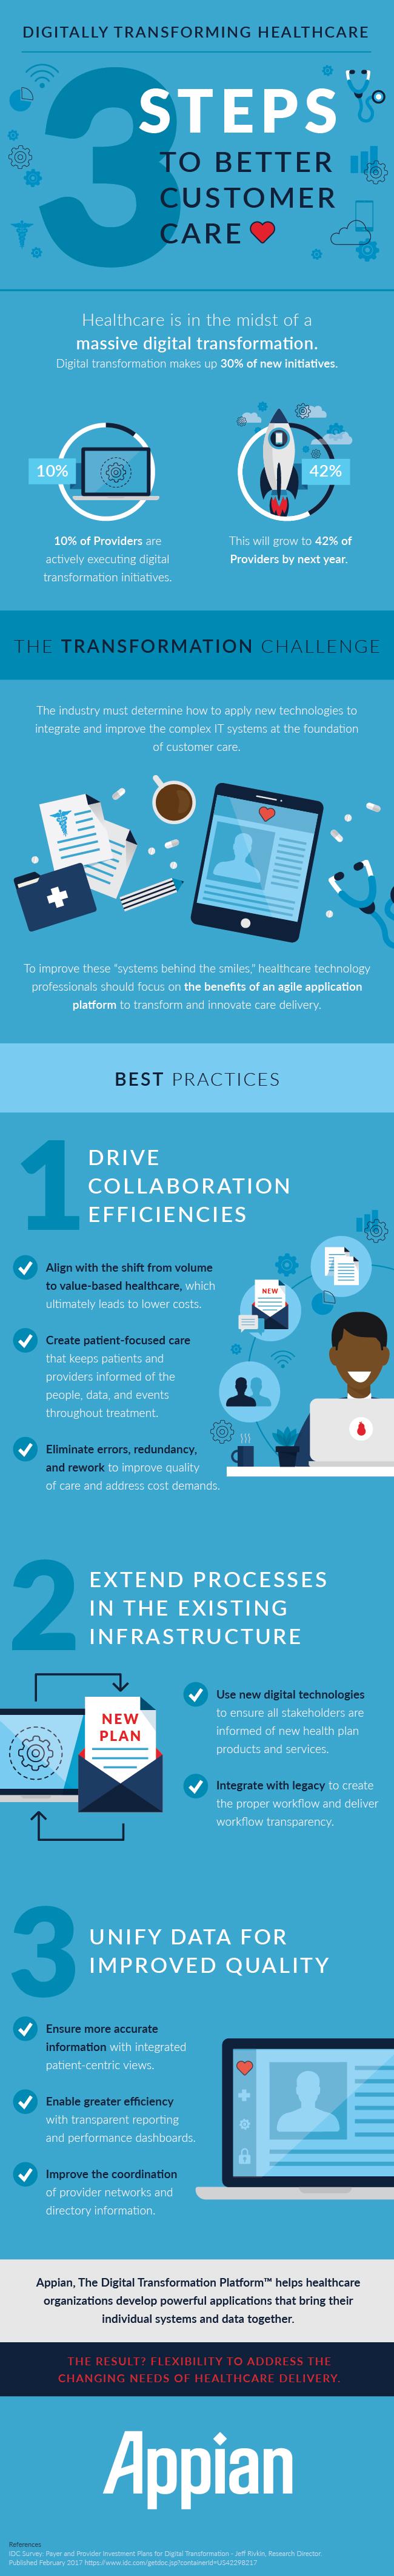 Digitally transforming healthcare in 3 steps.